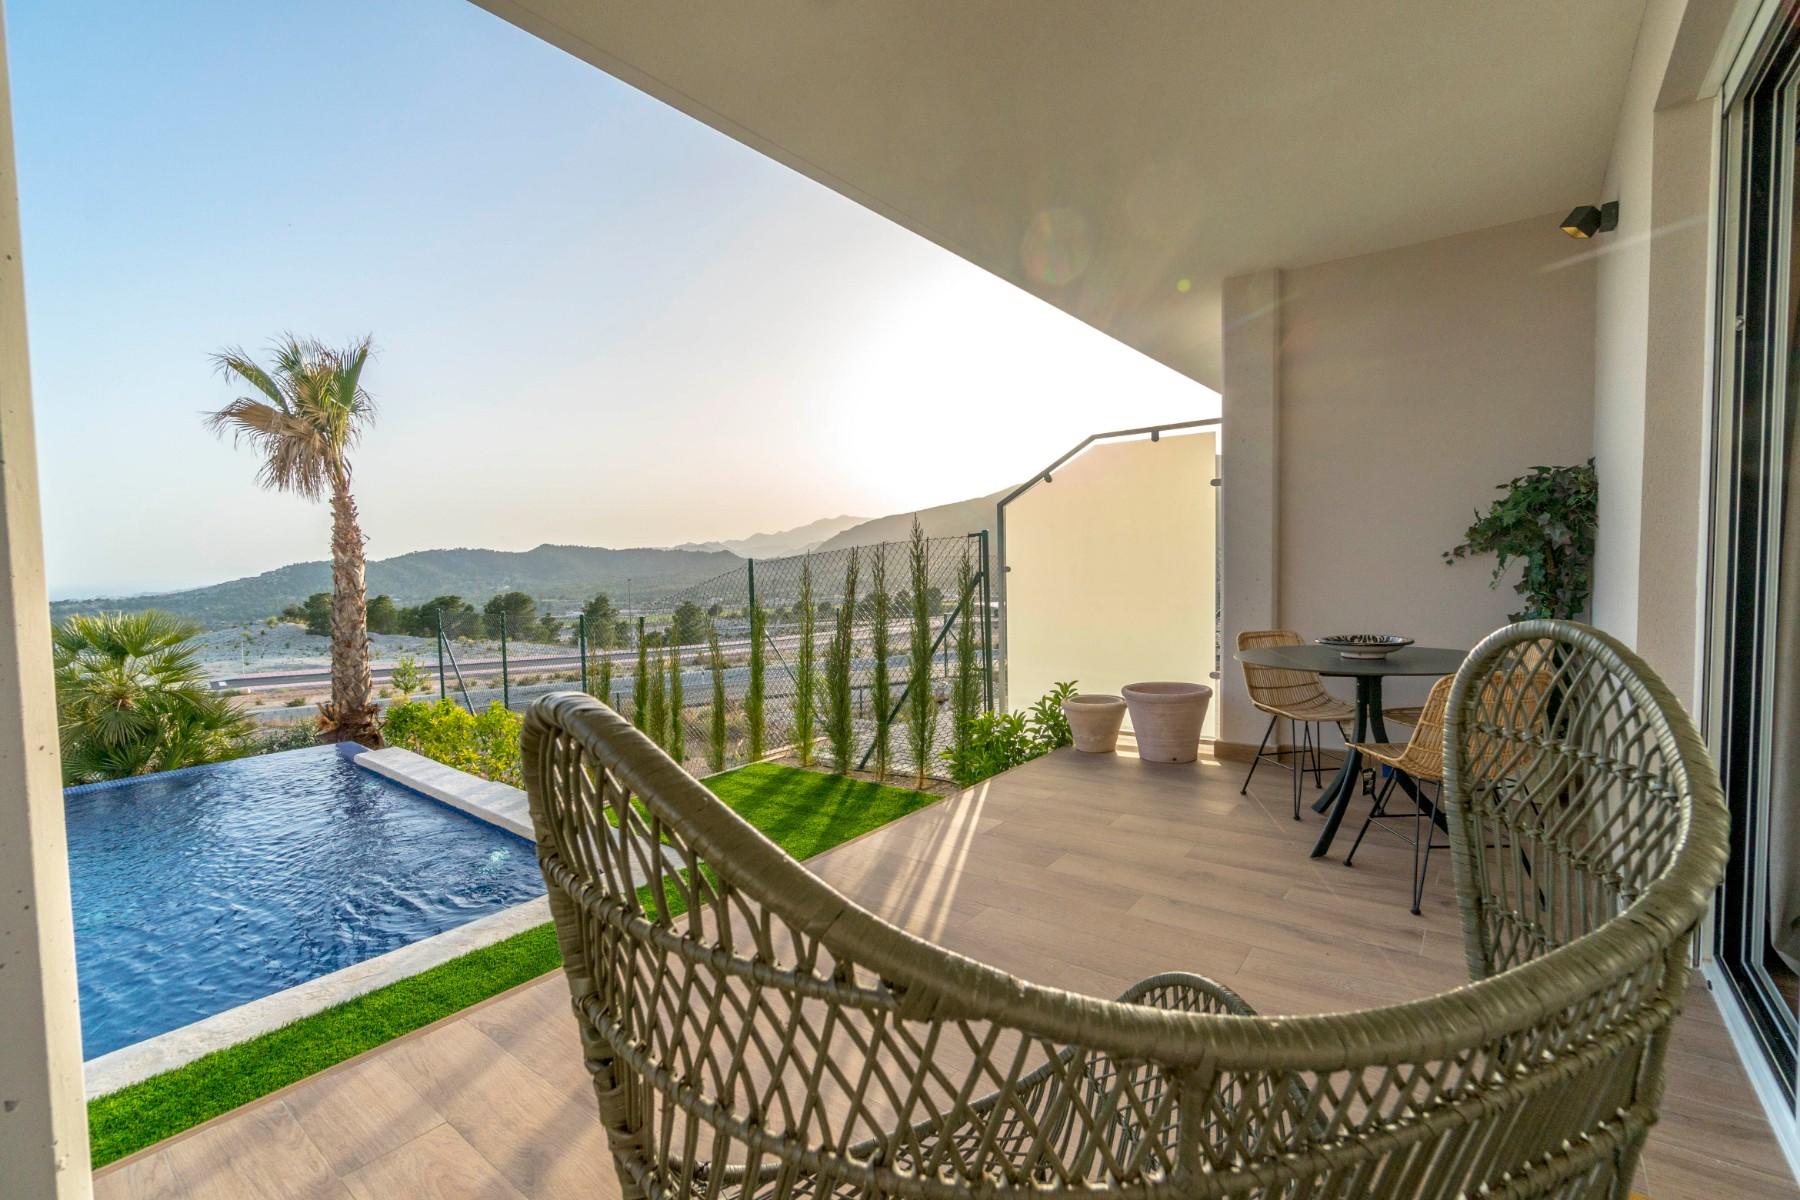 For sale: 2 bedroom house / villa in Finestrat